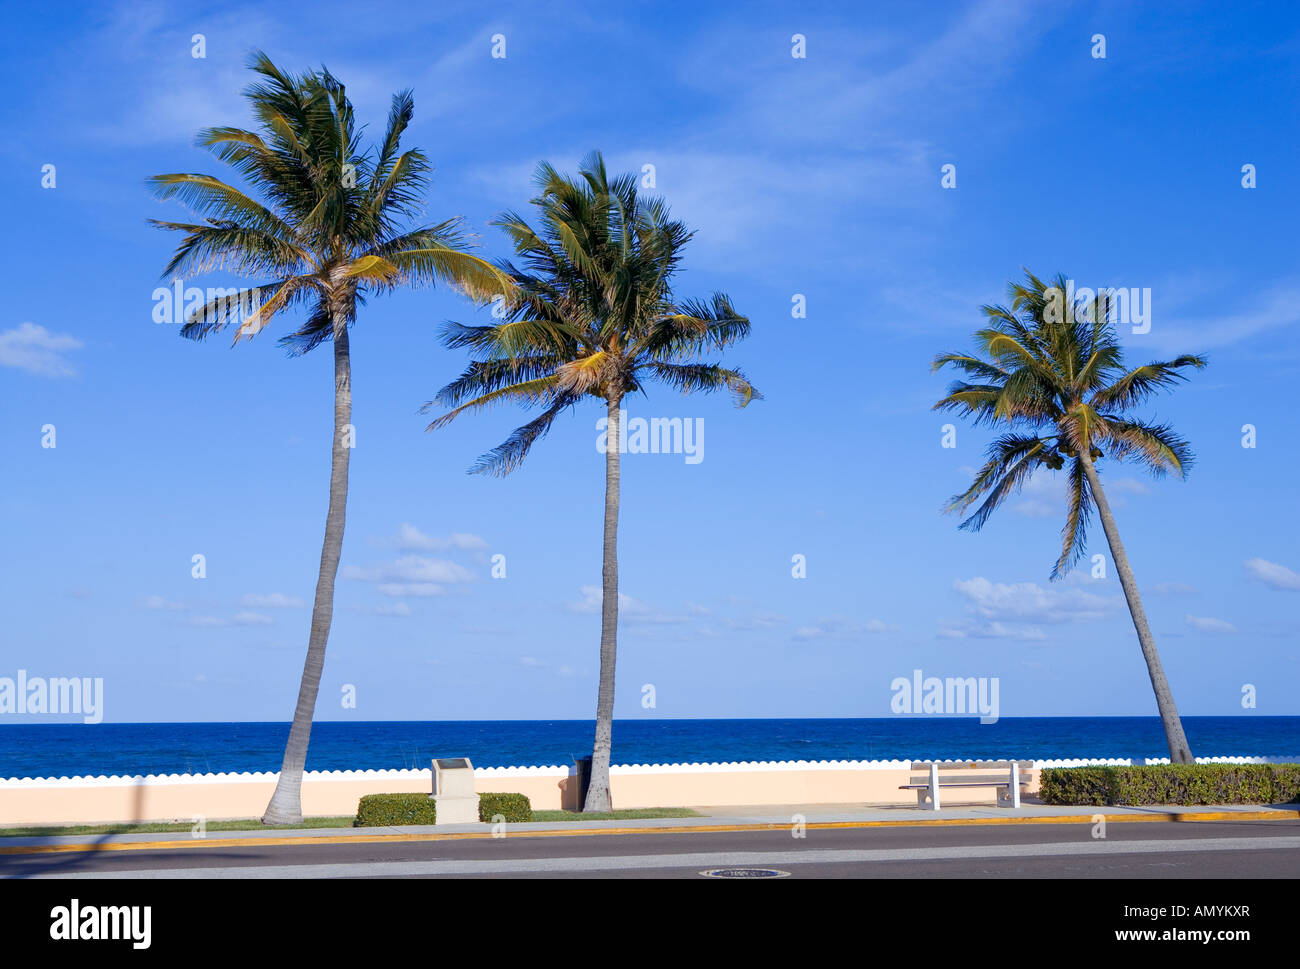 Boardwalk along water in Palm Beach, Florida, USA - Stock Image